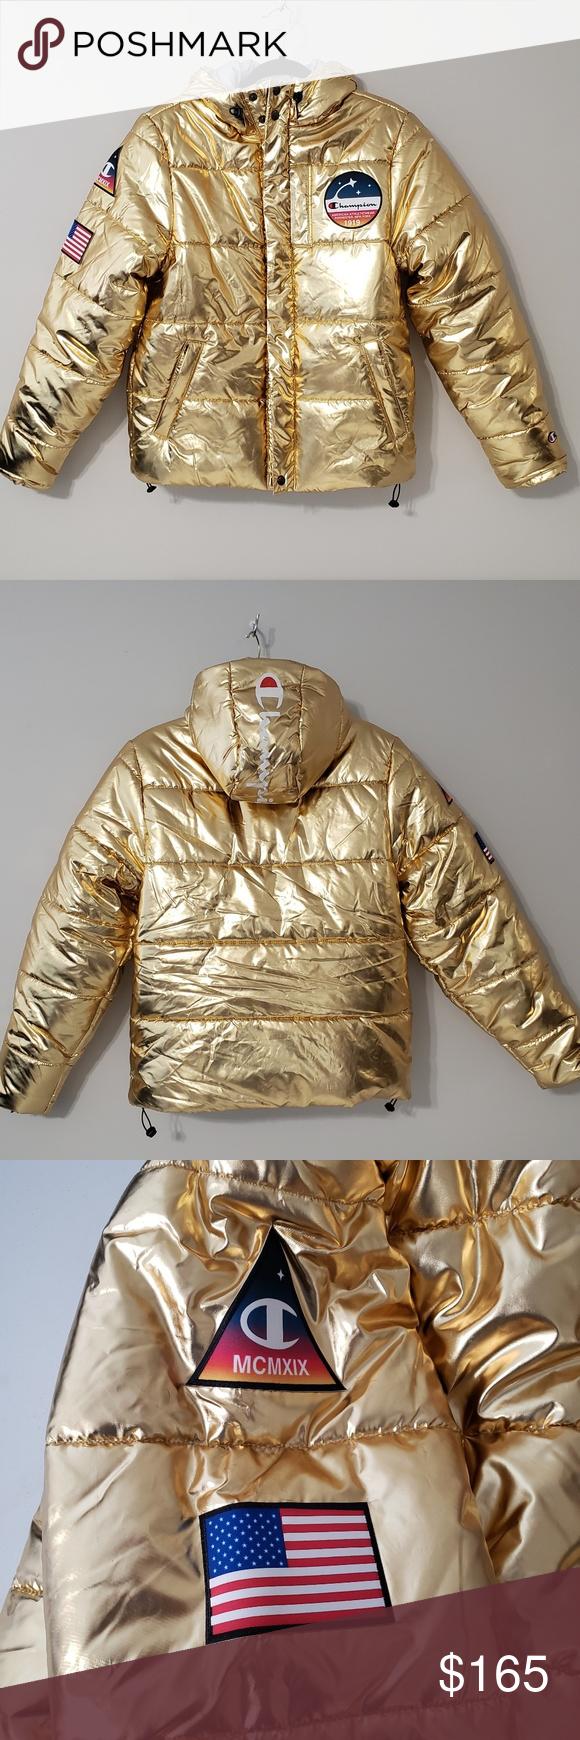 Champion Gold Nasa Puffer Jacket Nasa Clothes Clothes Design Clothes [ 1740 x 580 Pixel ]